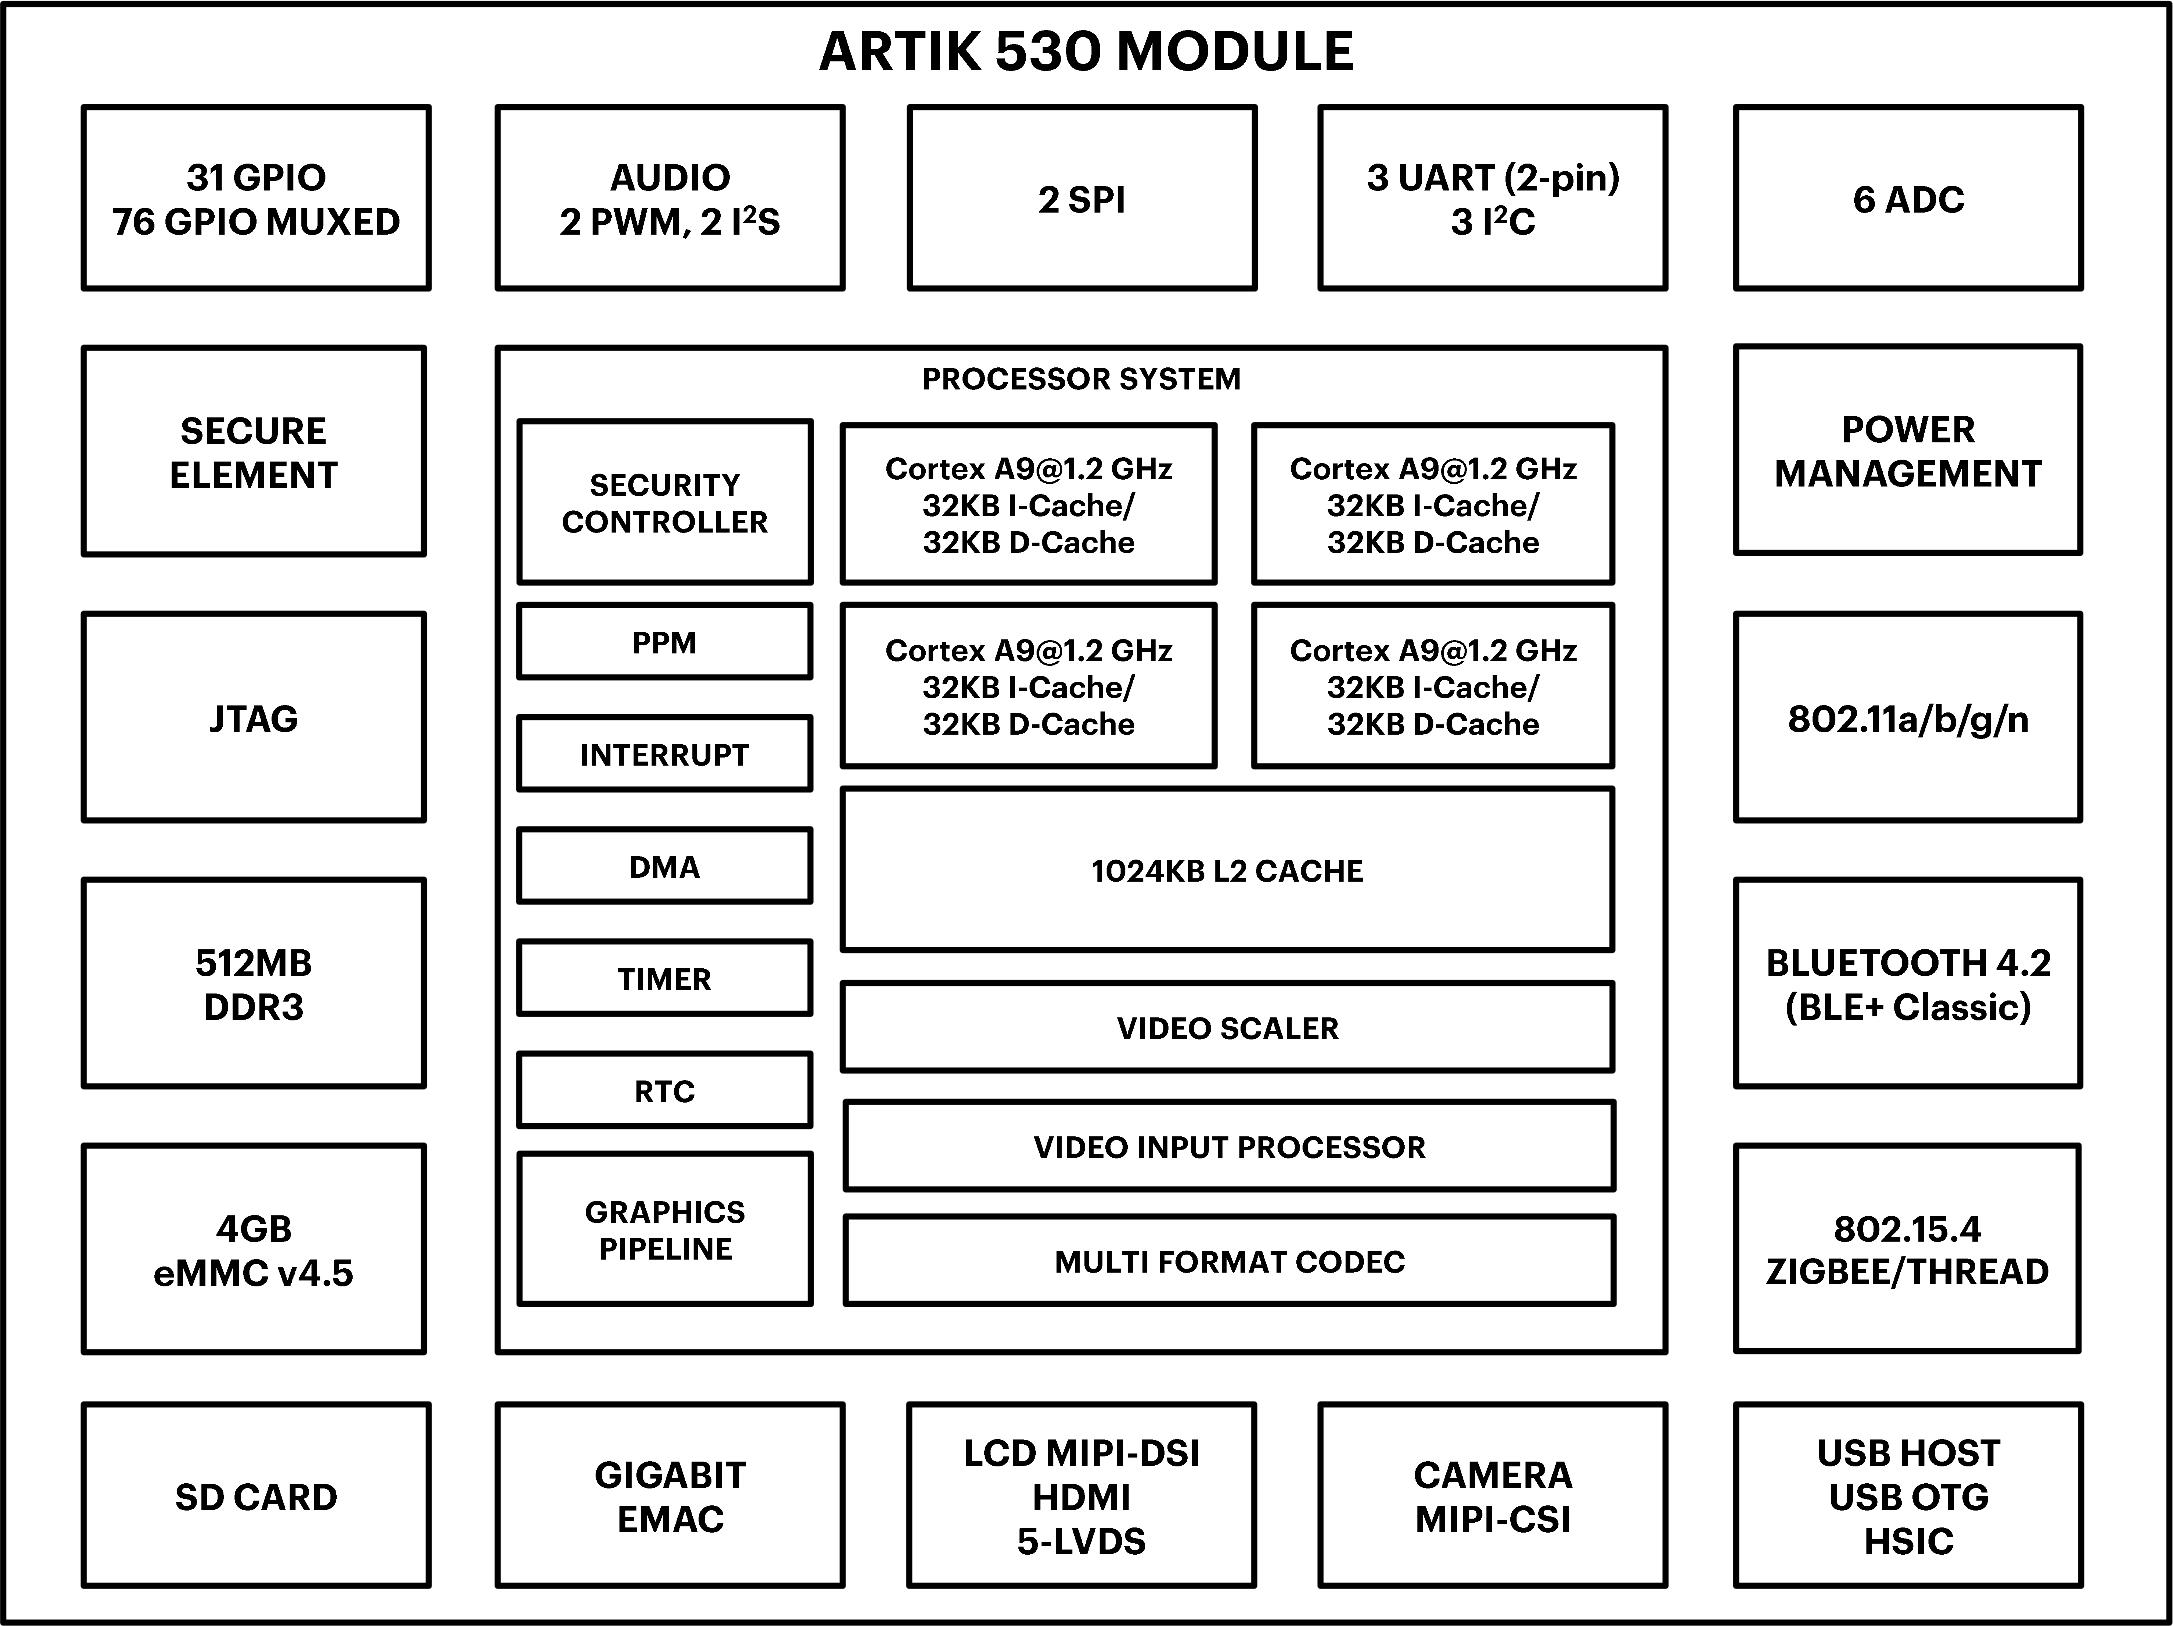 Samsung introduces artik 530 iot module development kit with wifi artik 530 module block diagram click to enlarge ccuart Image collections